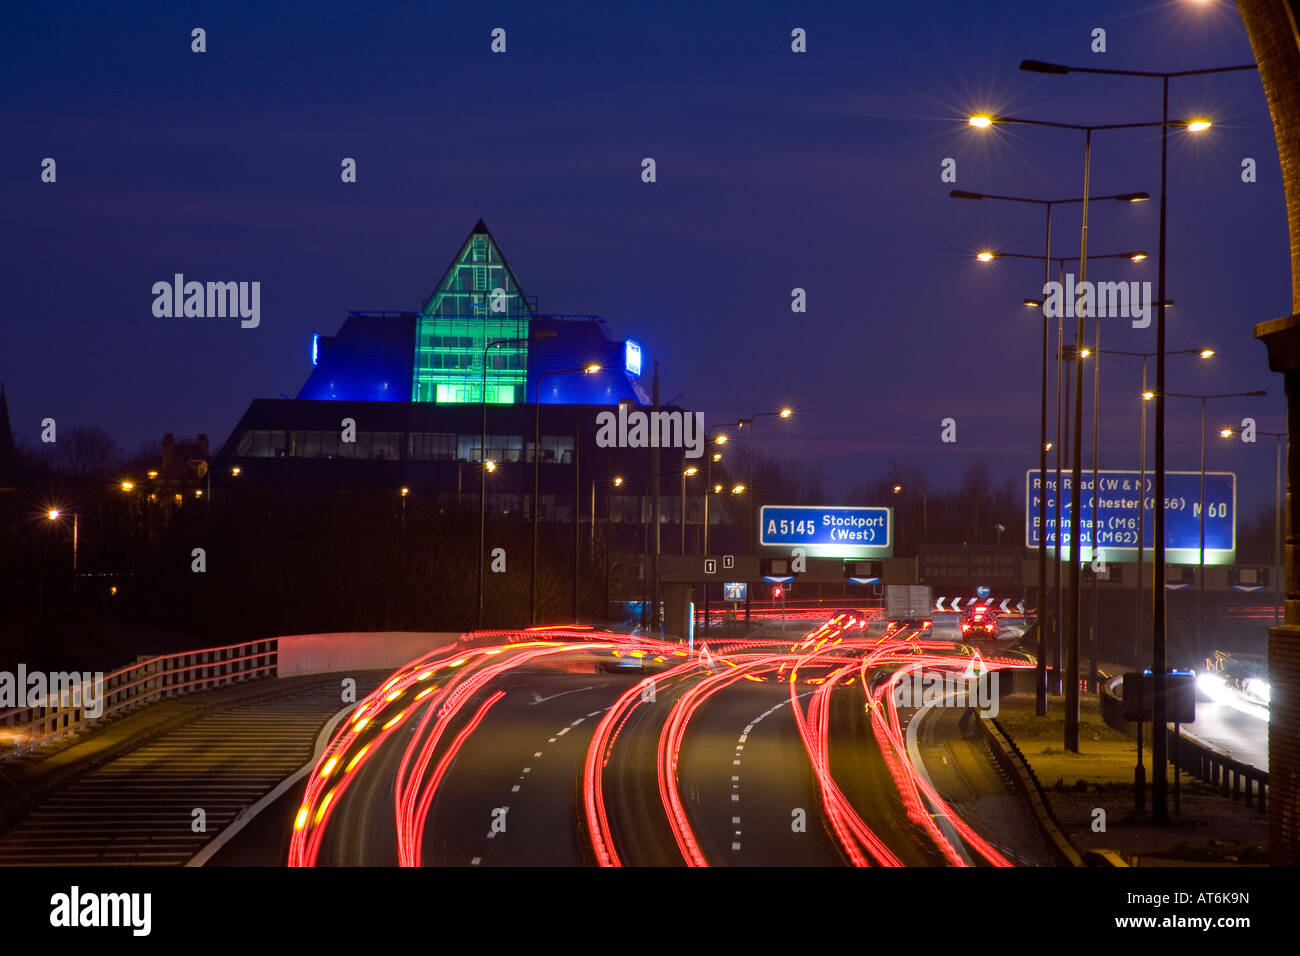 M60 Motorway, Stockport Pyramid . Stockport, Greater Manchester, United Kingdom. - Stock Image